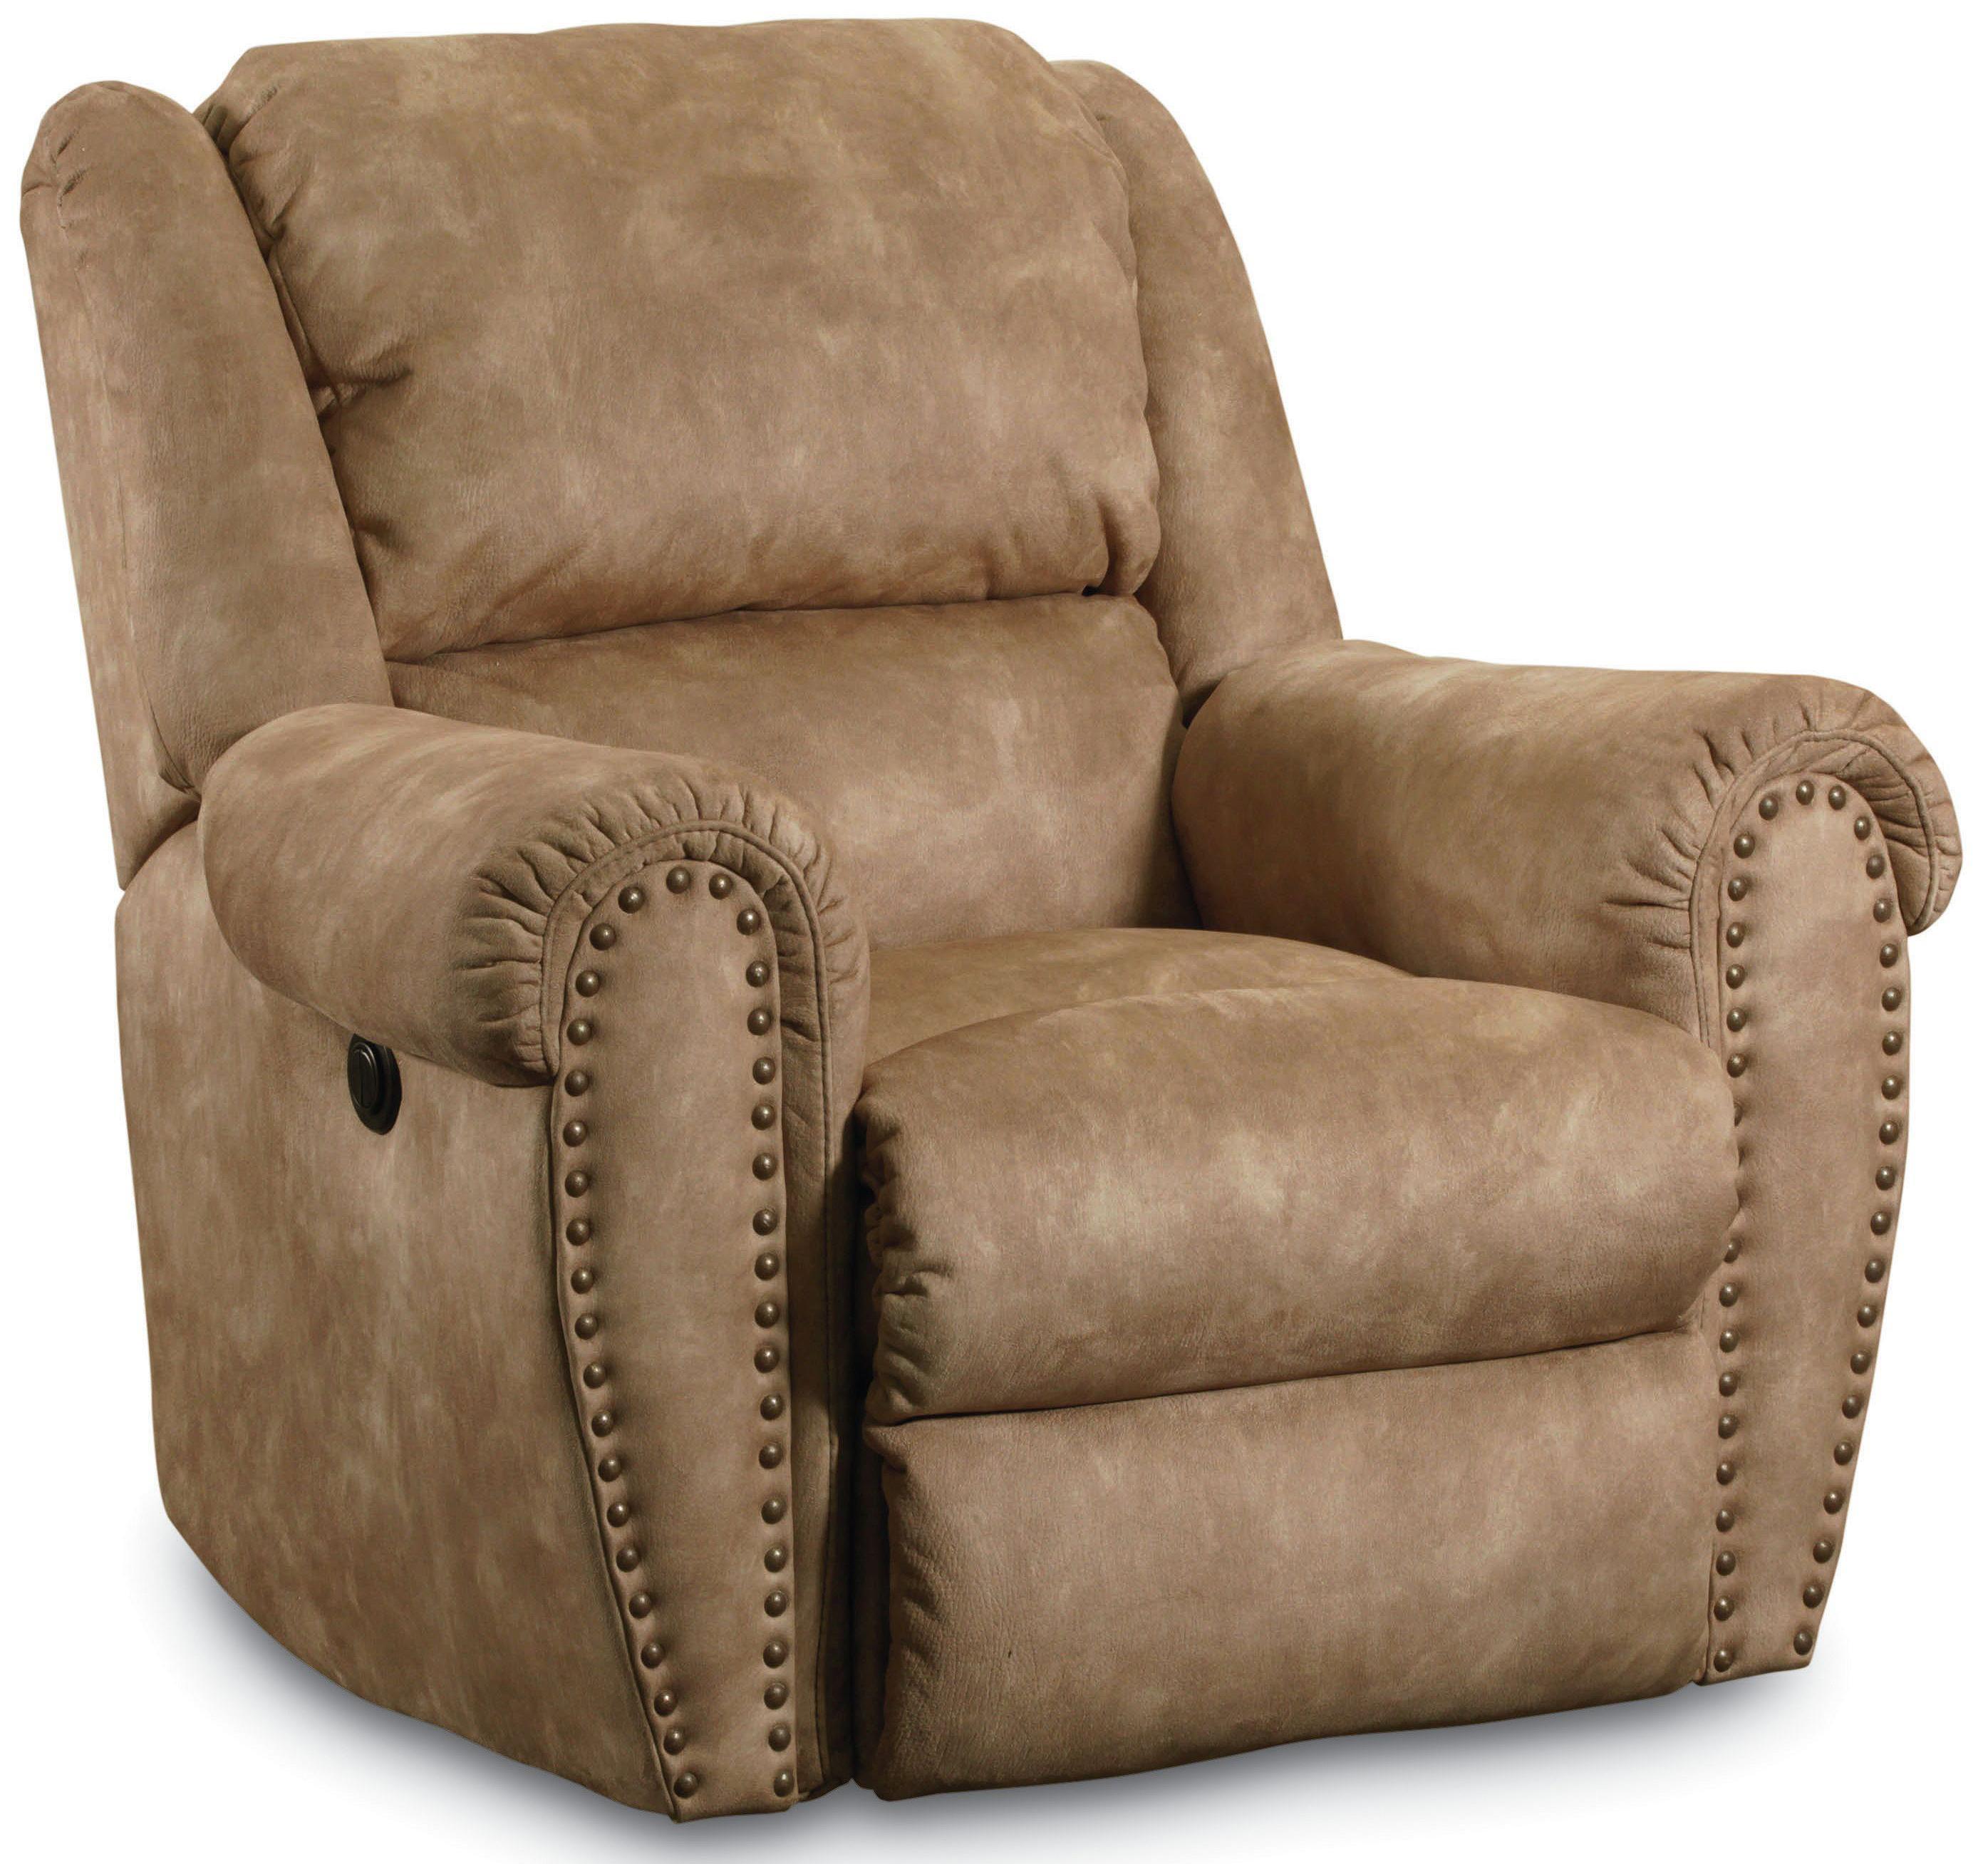 Prime Summerlin Wall Saver Recliner Andrewgaddart Wooden Chair Designs For Living Room Andrewgaddartcom